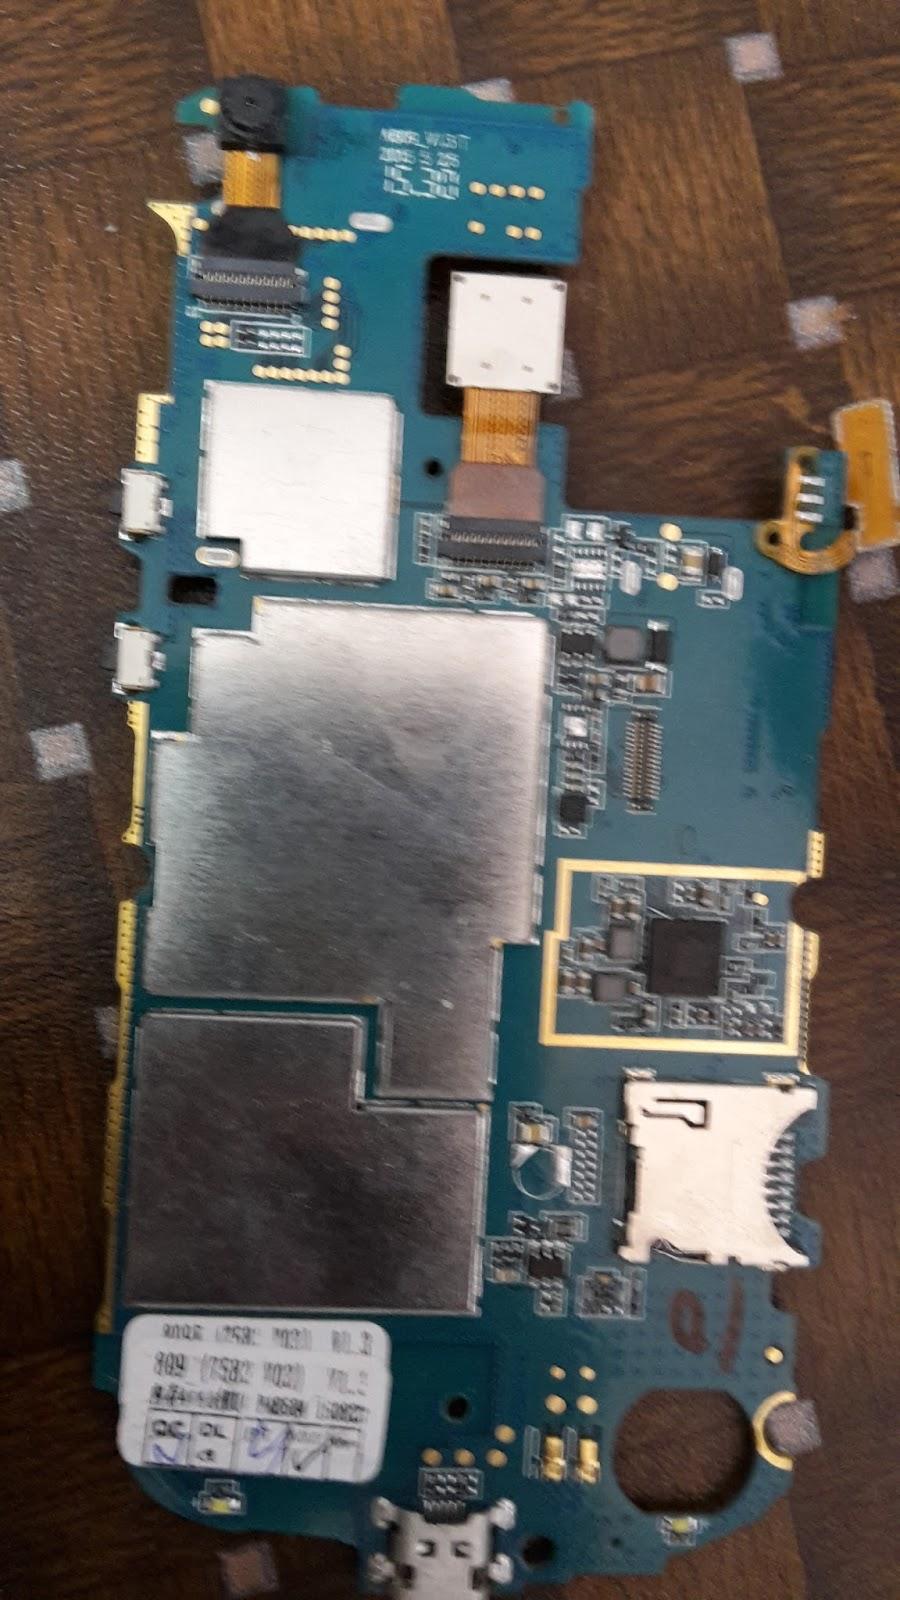 SAMSUNG S7582 MT6572 NAND 4 4 2 DEAD FIX, LCD FIX, SP FLASH